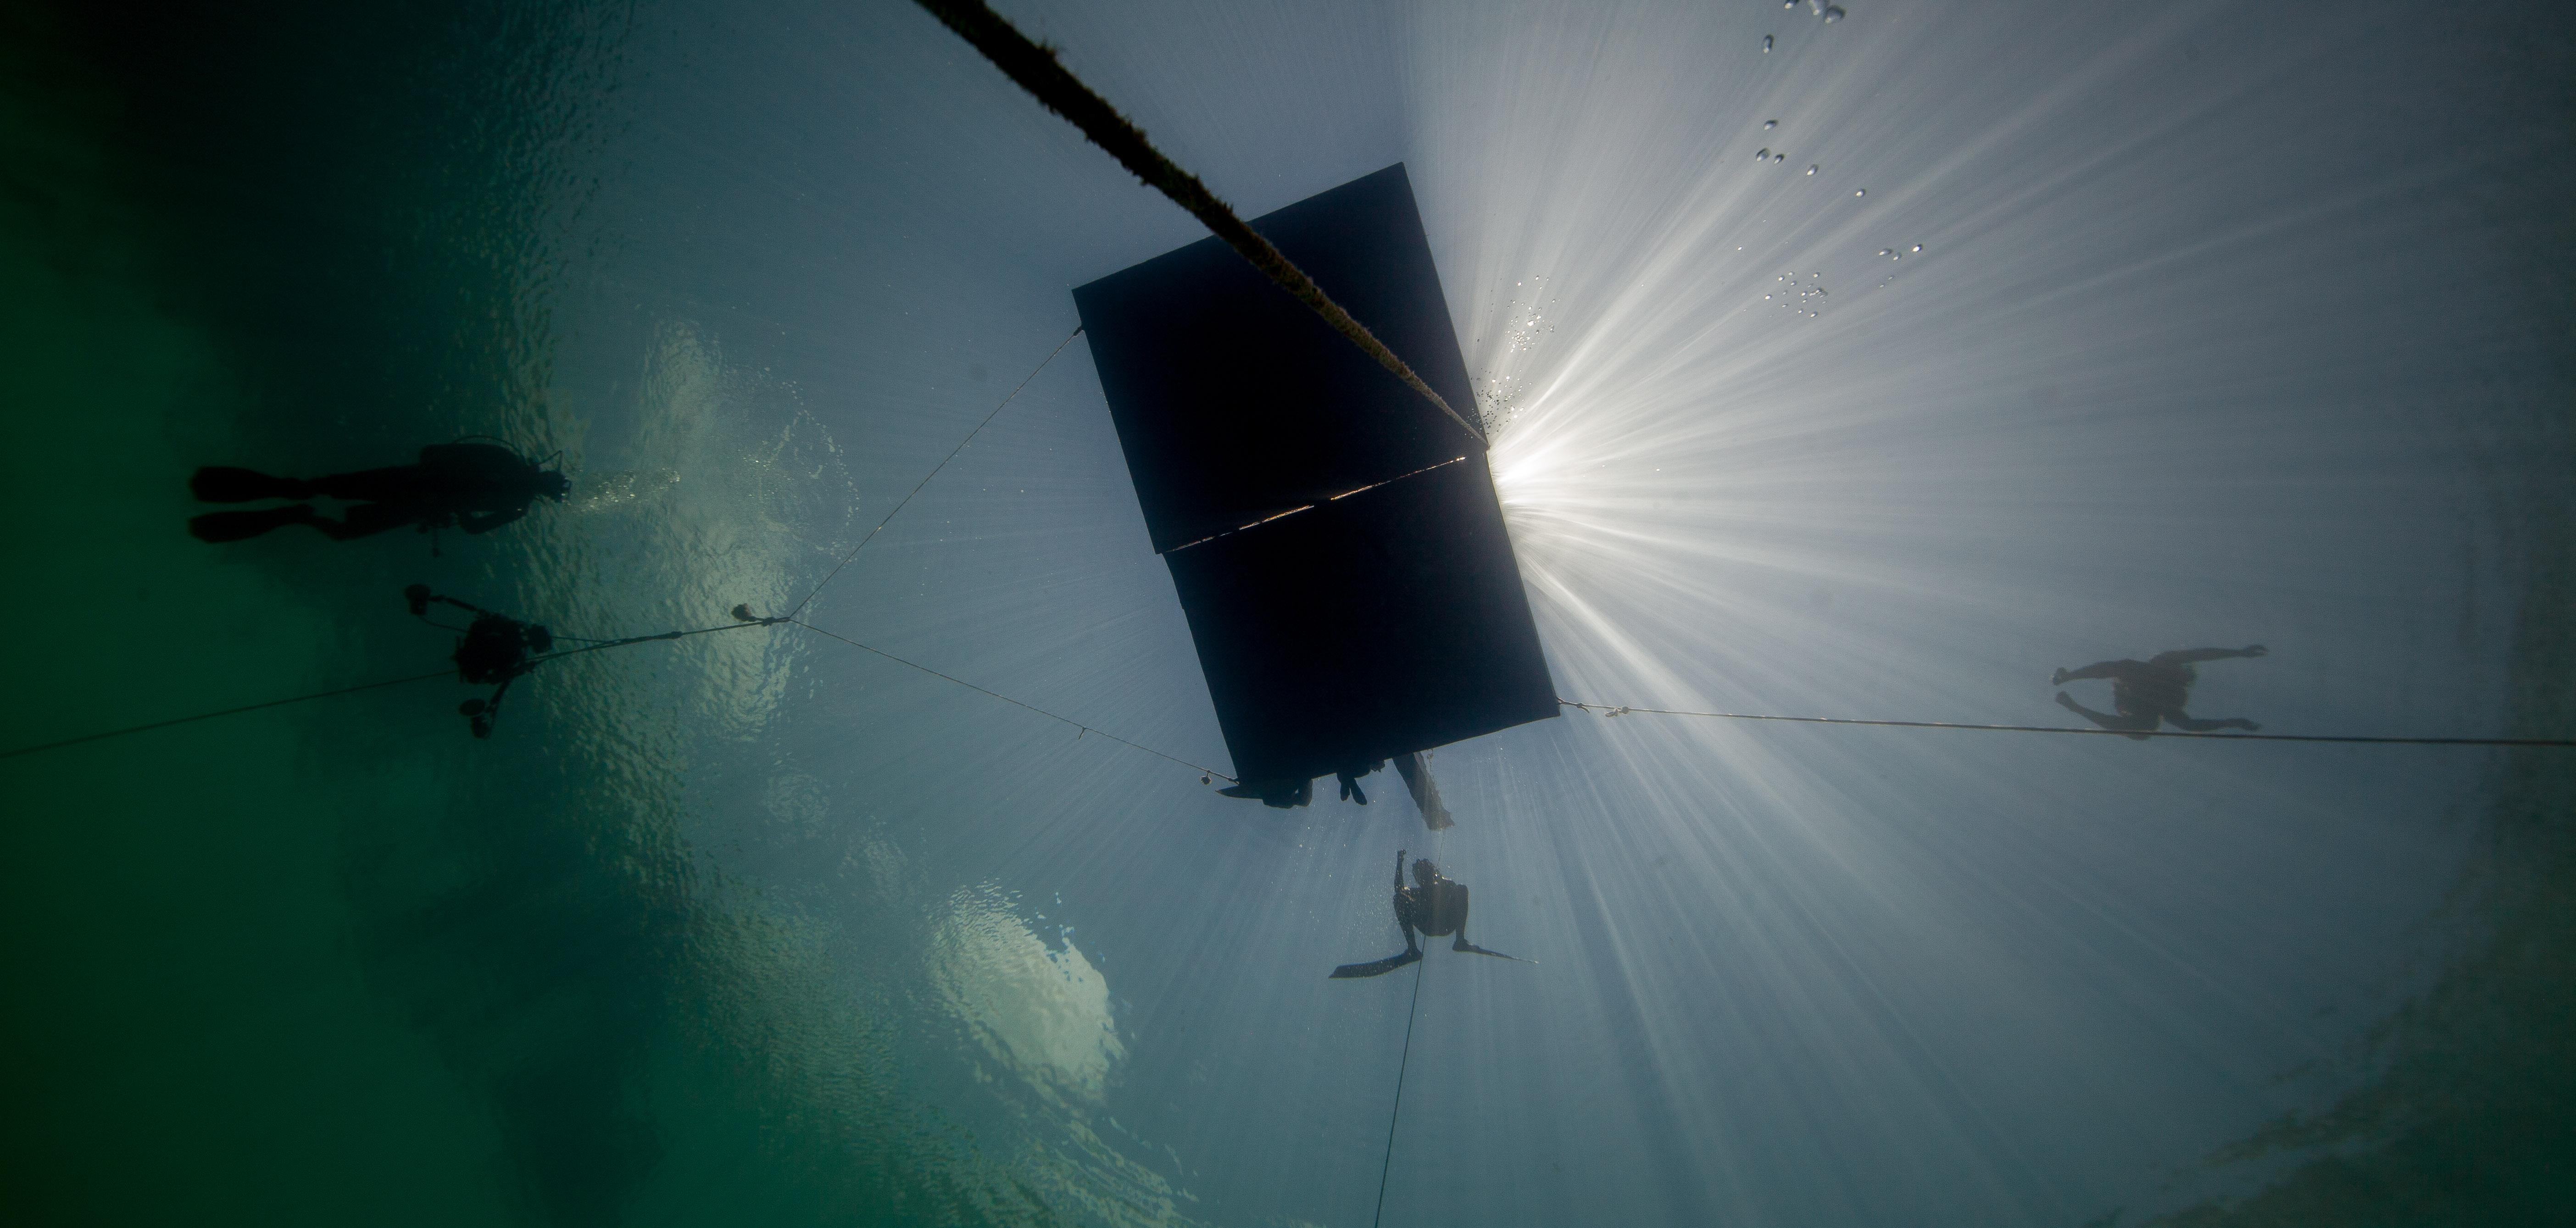 Underwater Filming blog by Rich Stevenson